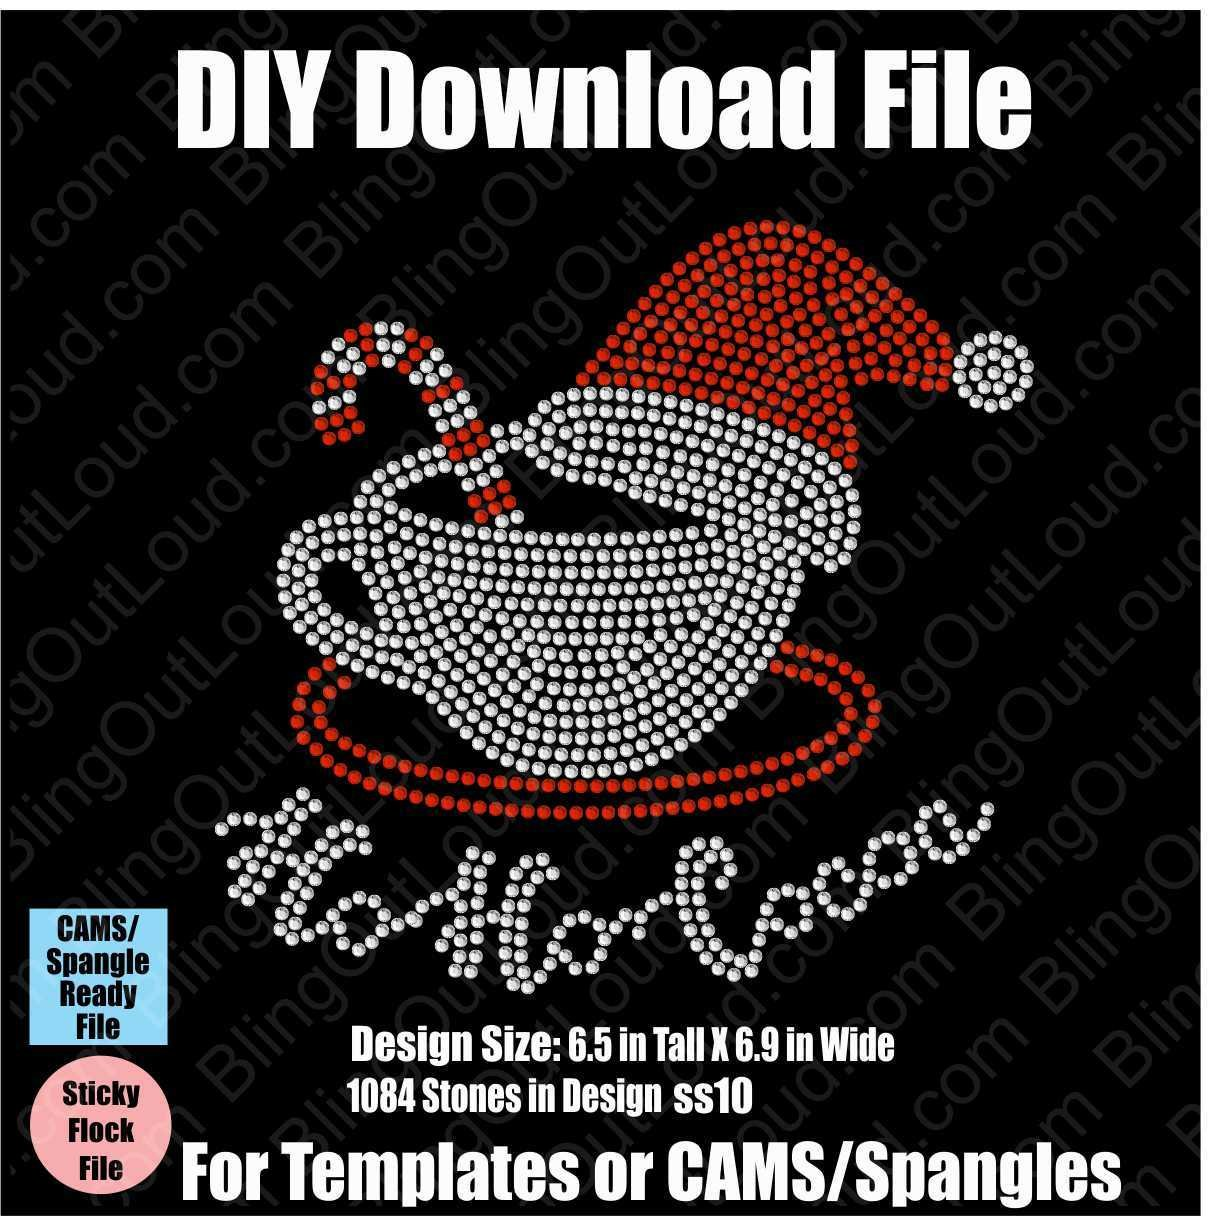 Ho Ho Cocoa Christmas Cheer DIY Rhinestone Download File for Templates or CAMS/ProSpangle